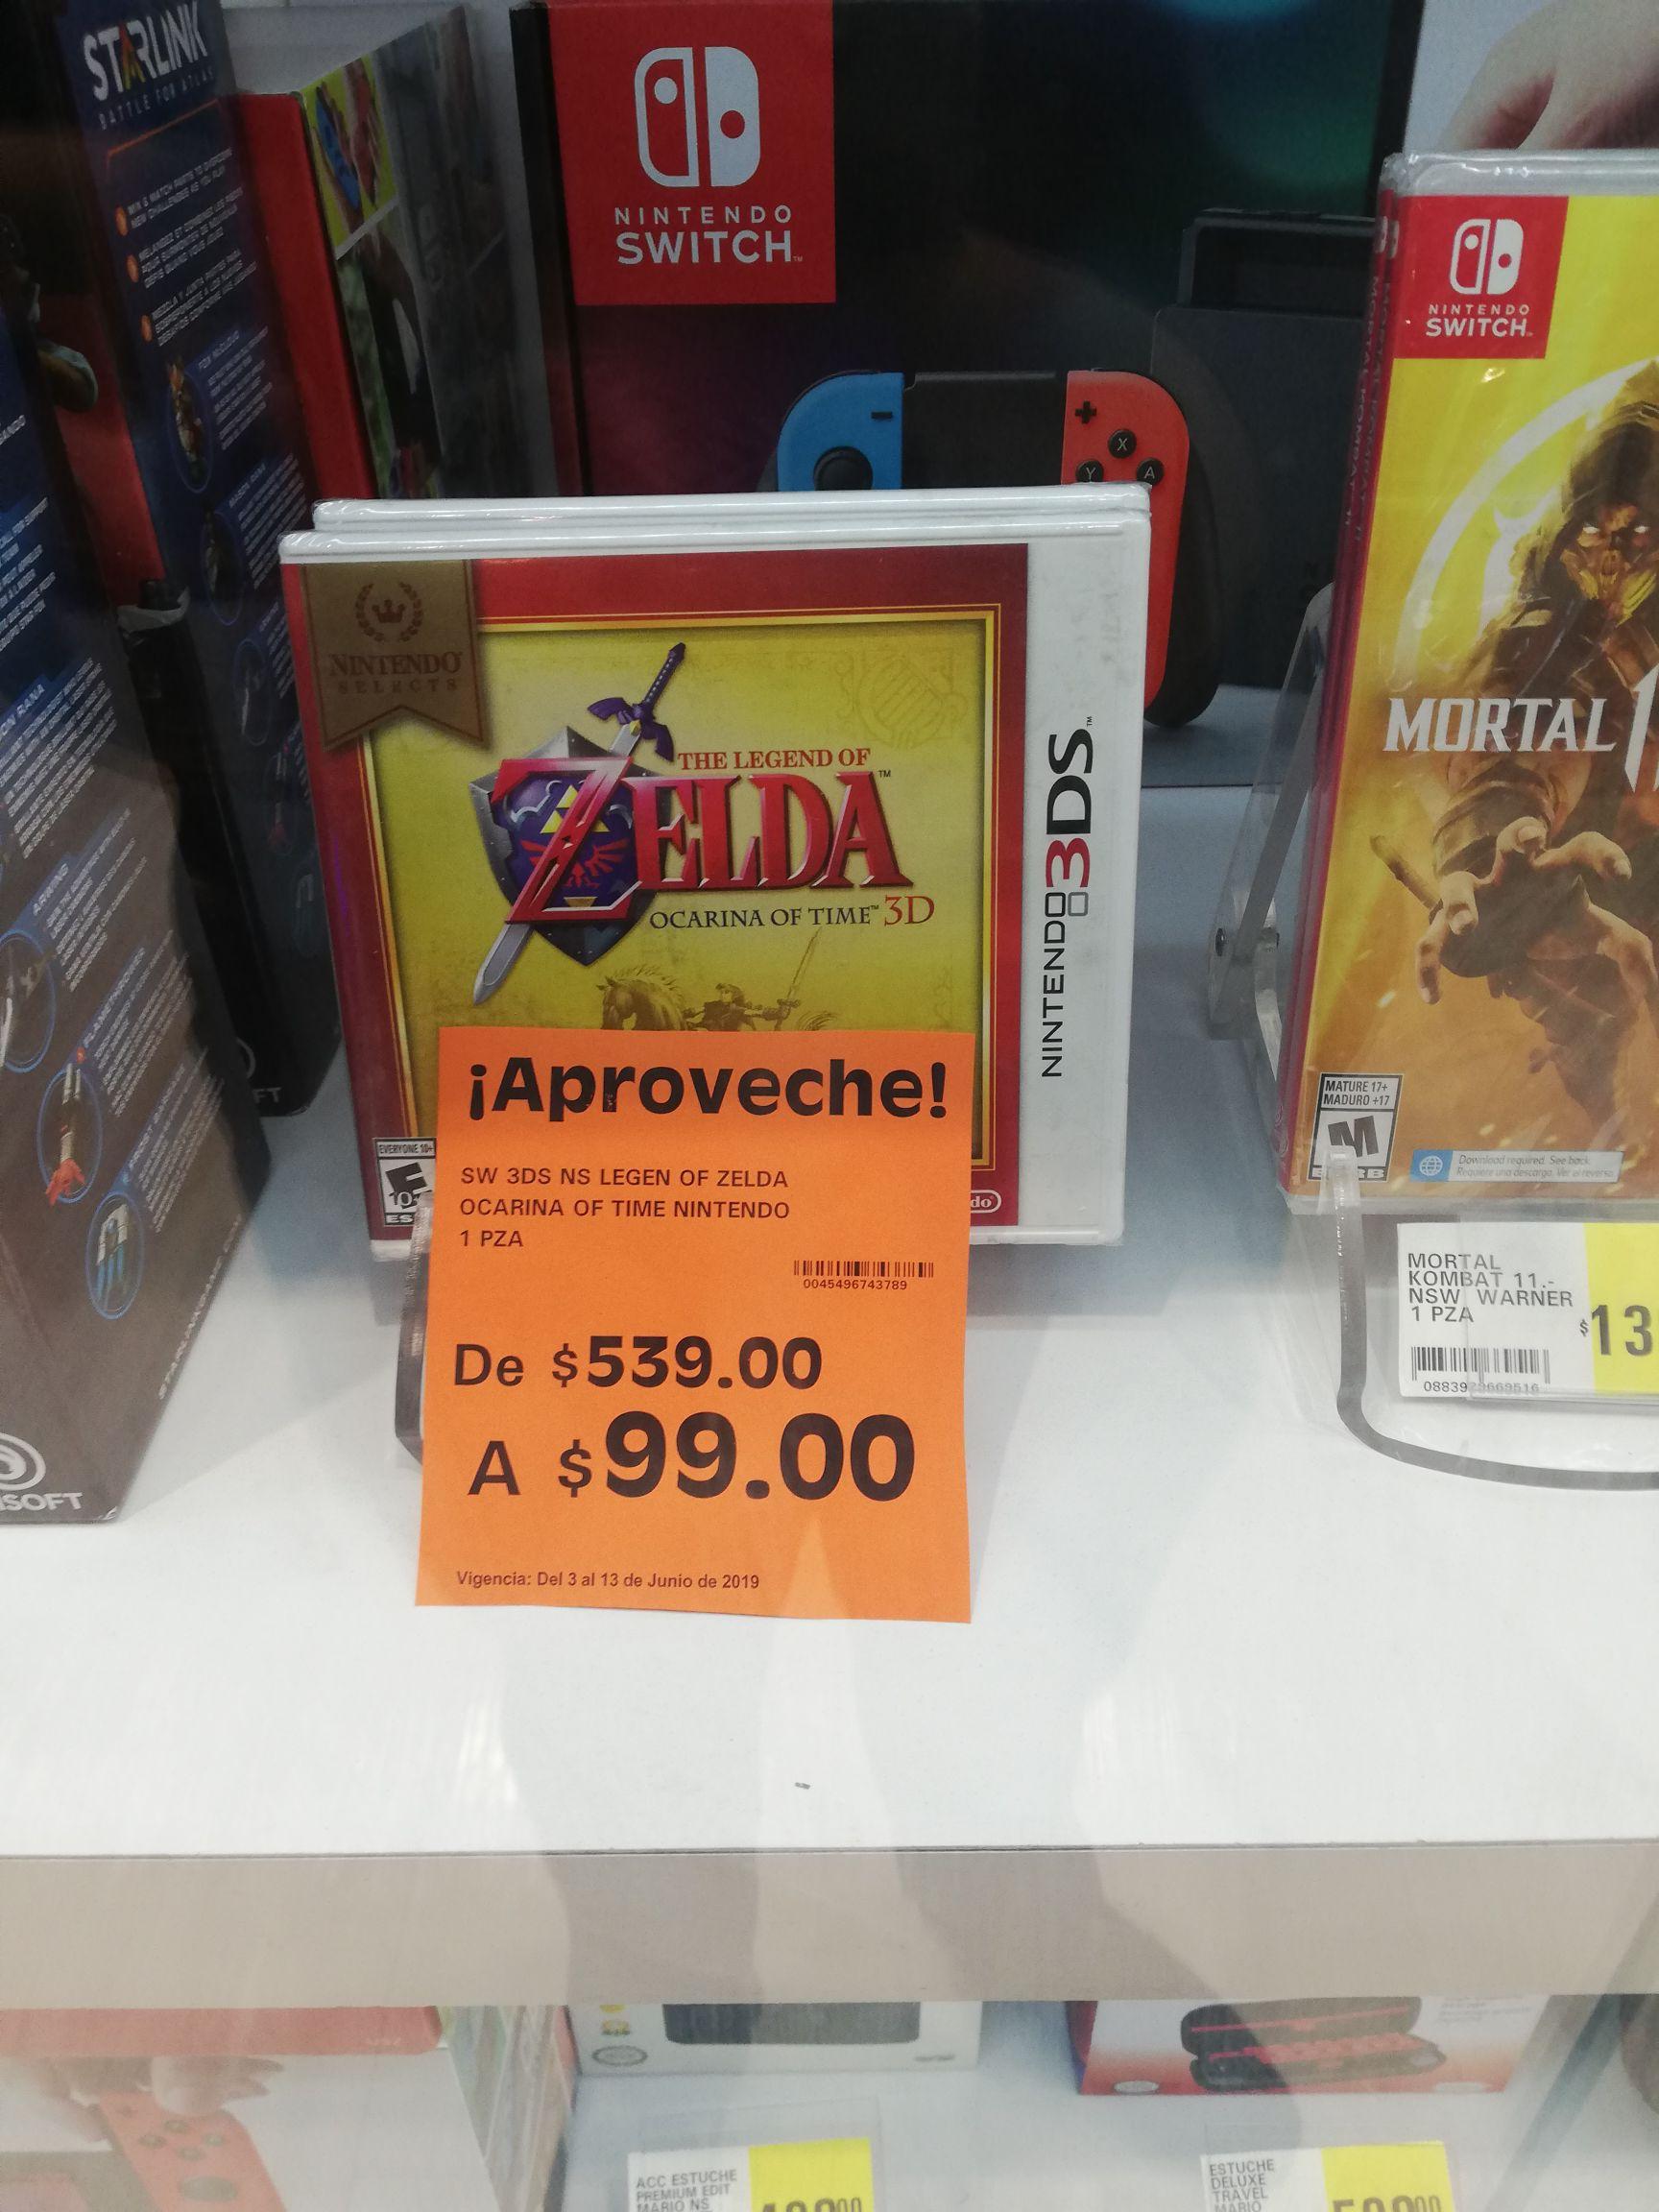 La comer Zelda ocarina of time Nintendo 3ds